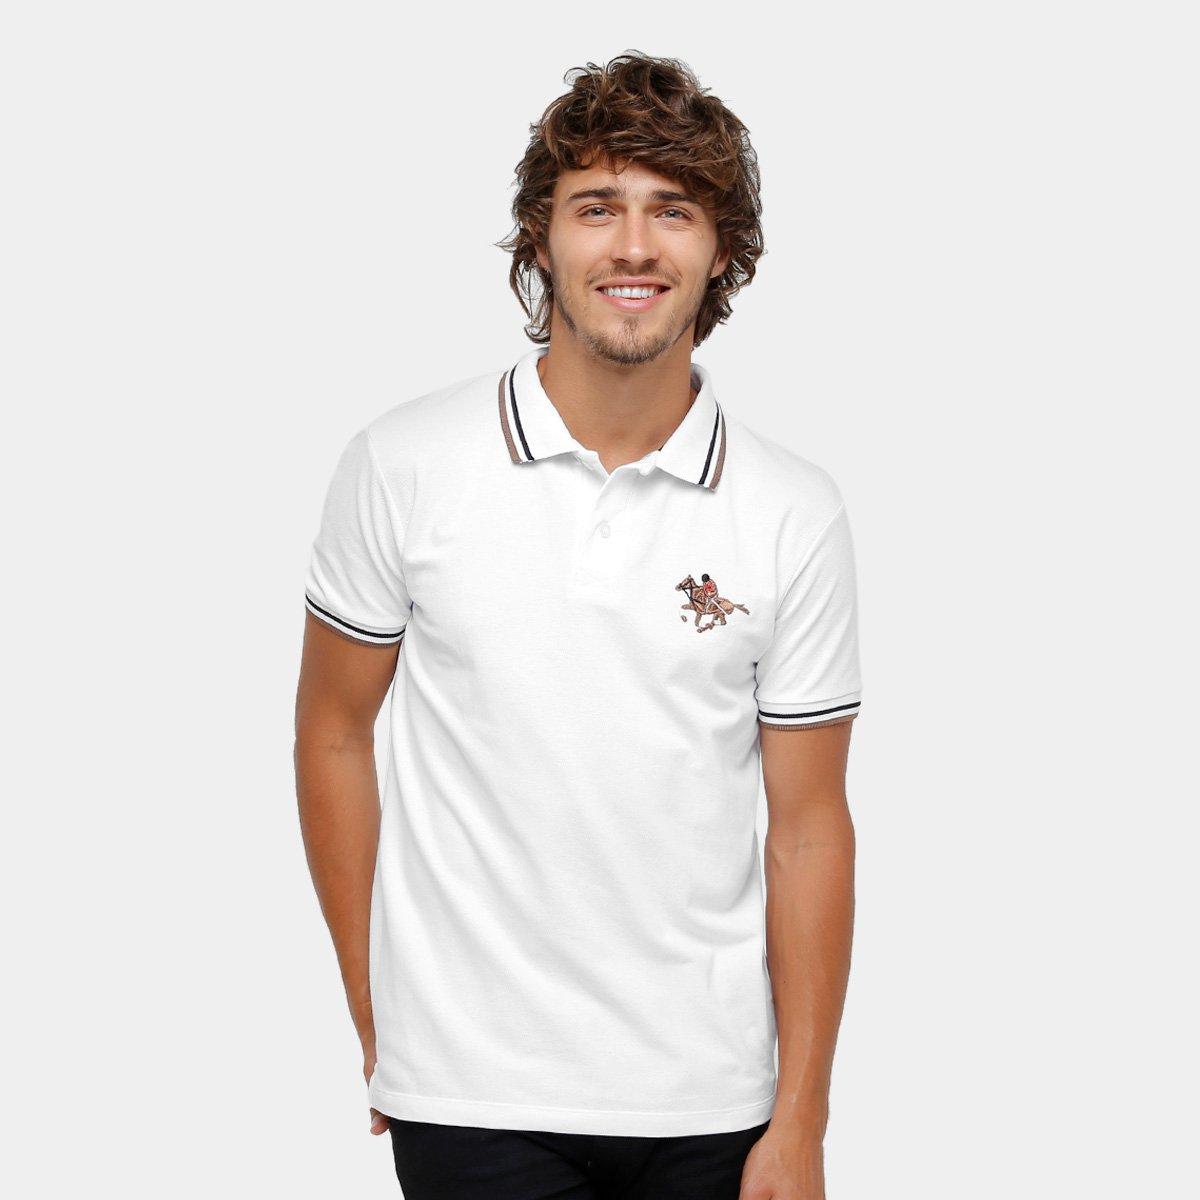 c8a3b13b2af5e Camisa Polo RG 518 Malha Frisos Bordada Masculina - Compre Agora ...